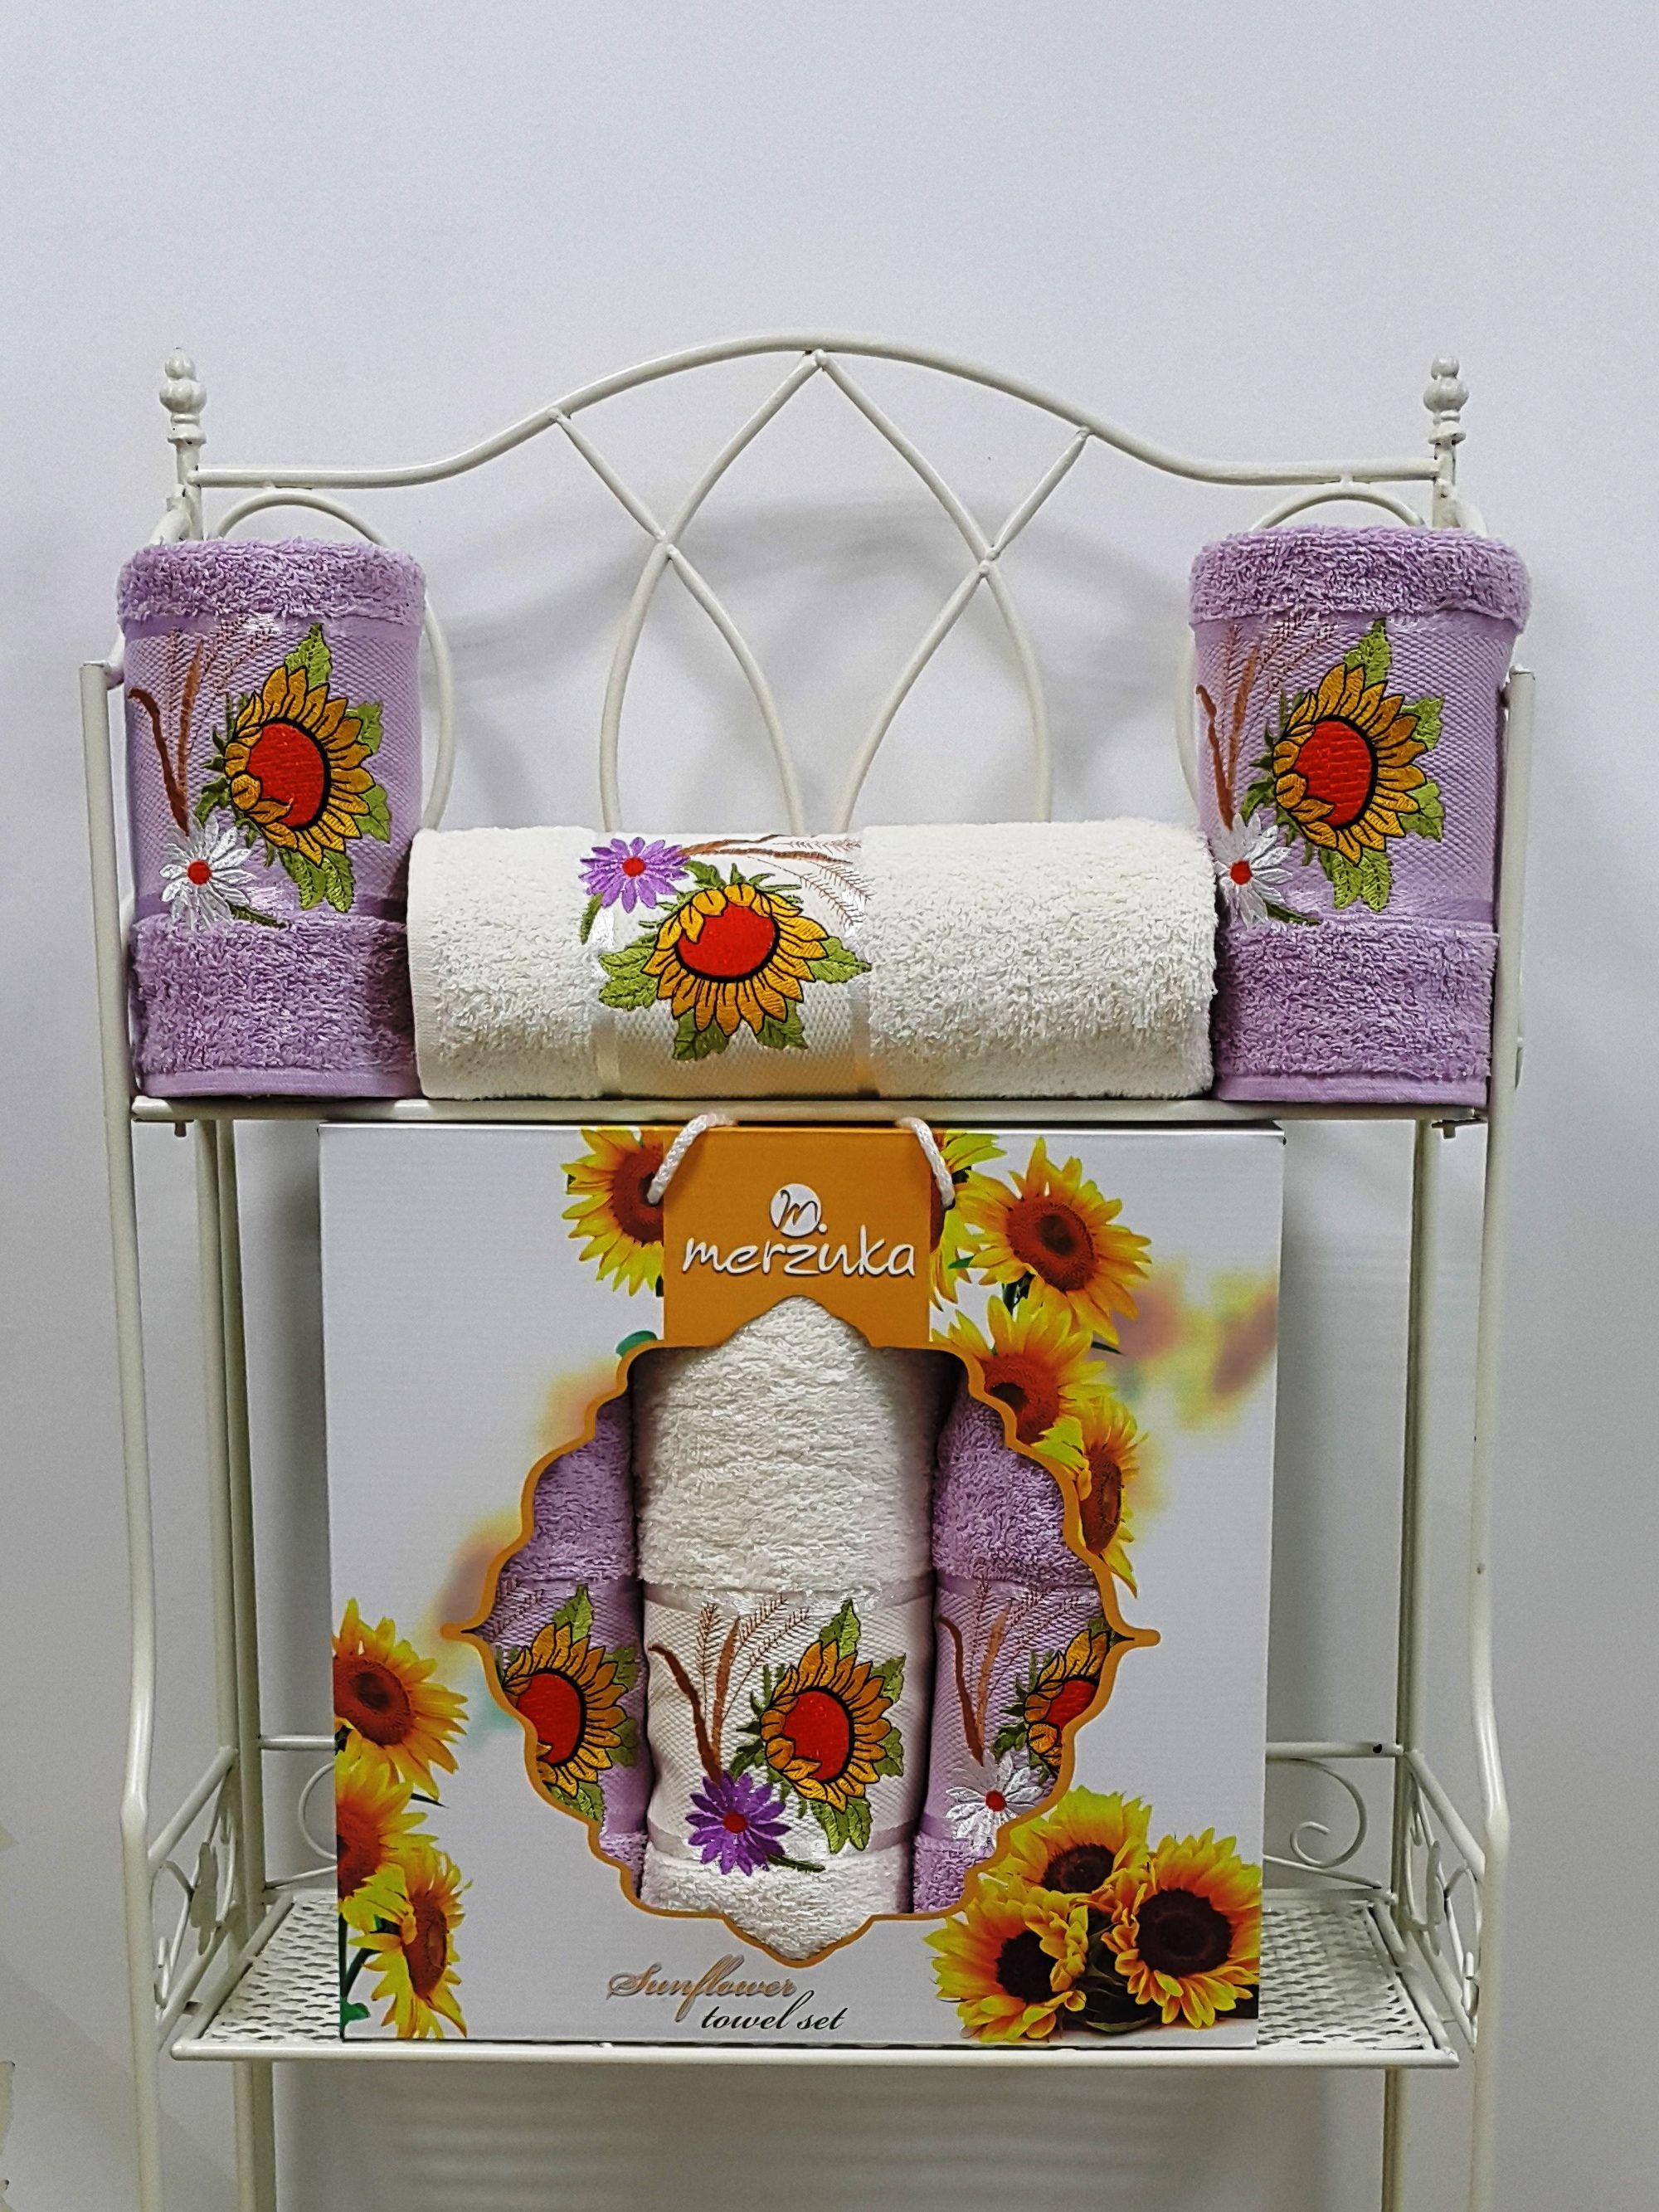 Полотенца Oran Merzuka Полотенце Sunflower Цвет: Сиреневый (Набор) набор из 3 полотенец merzuka sakura 50х90 2 70х140 8432 терракотовый